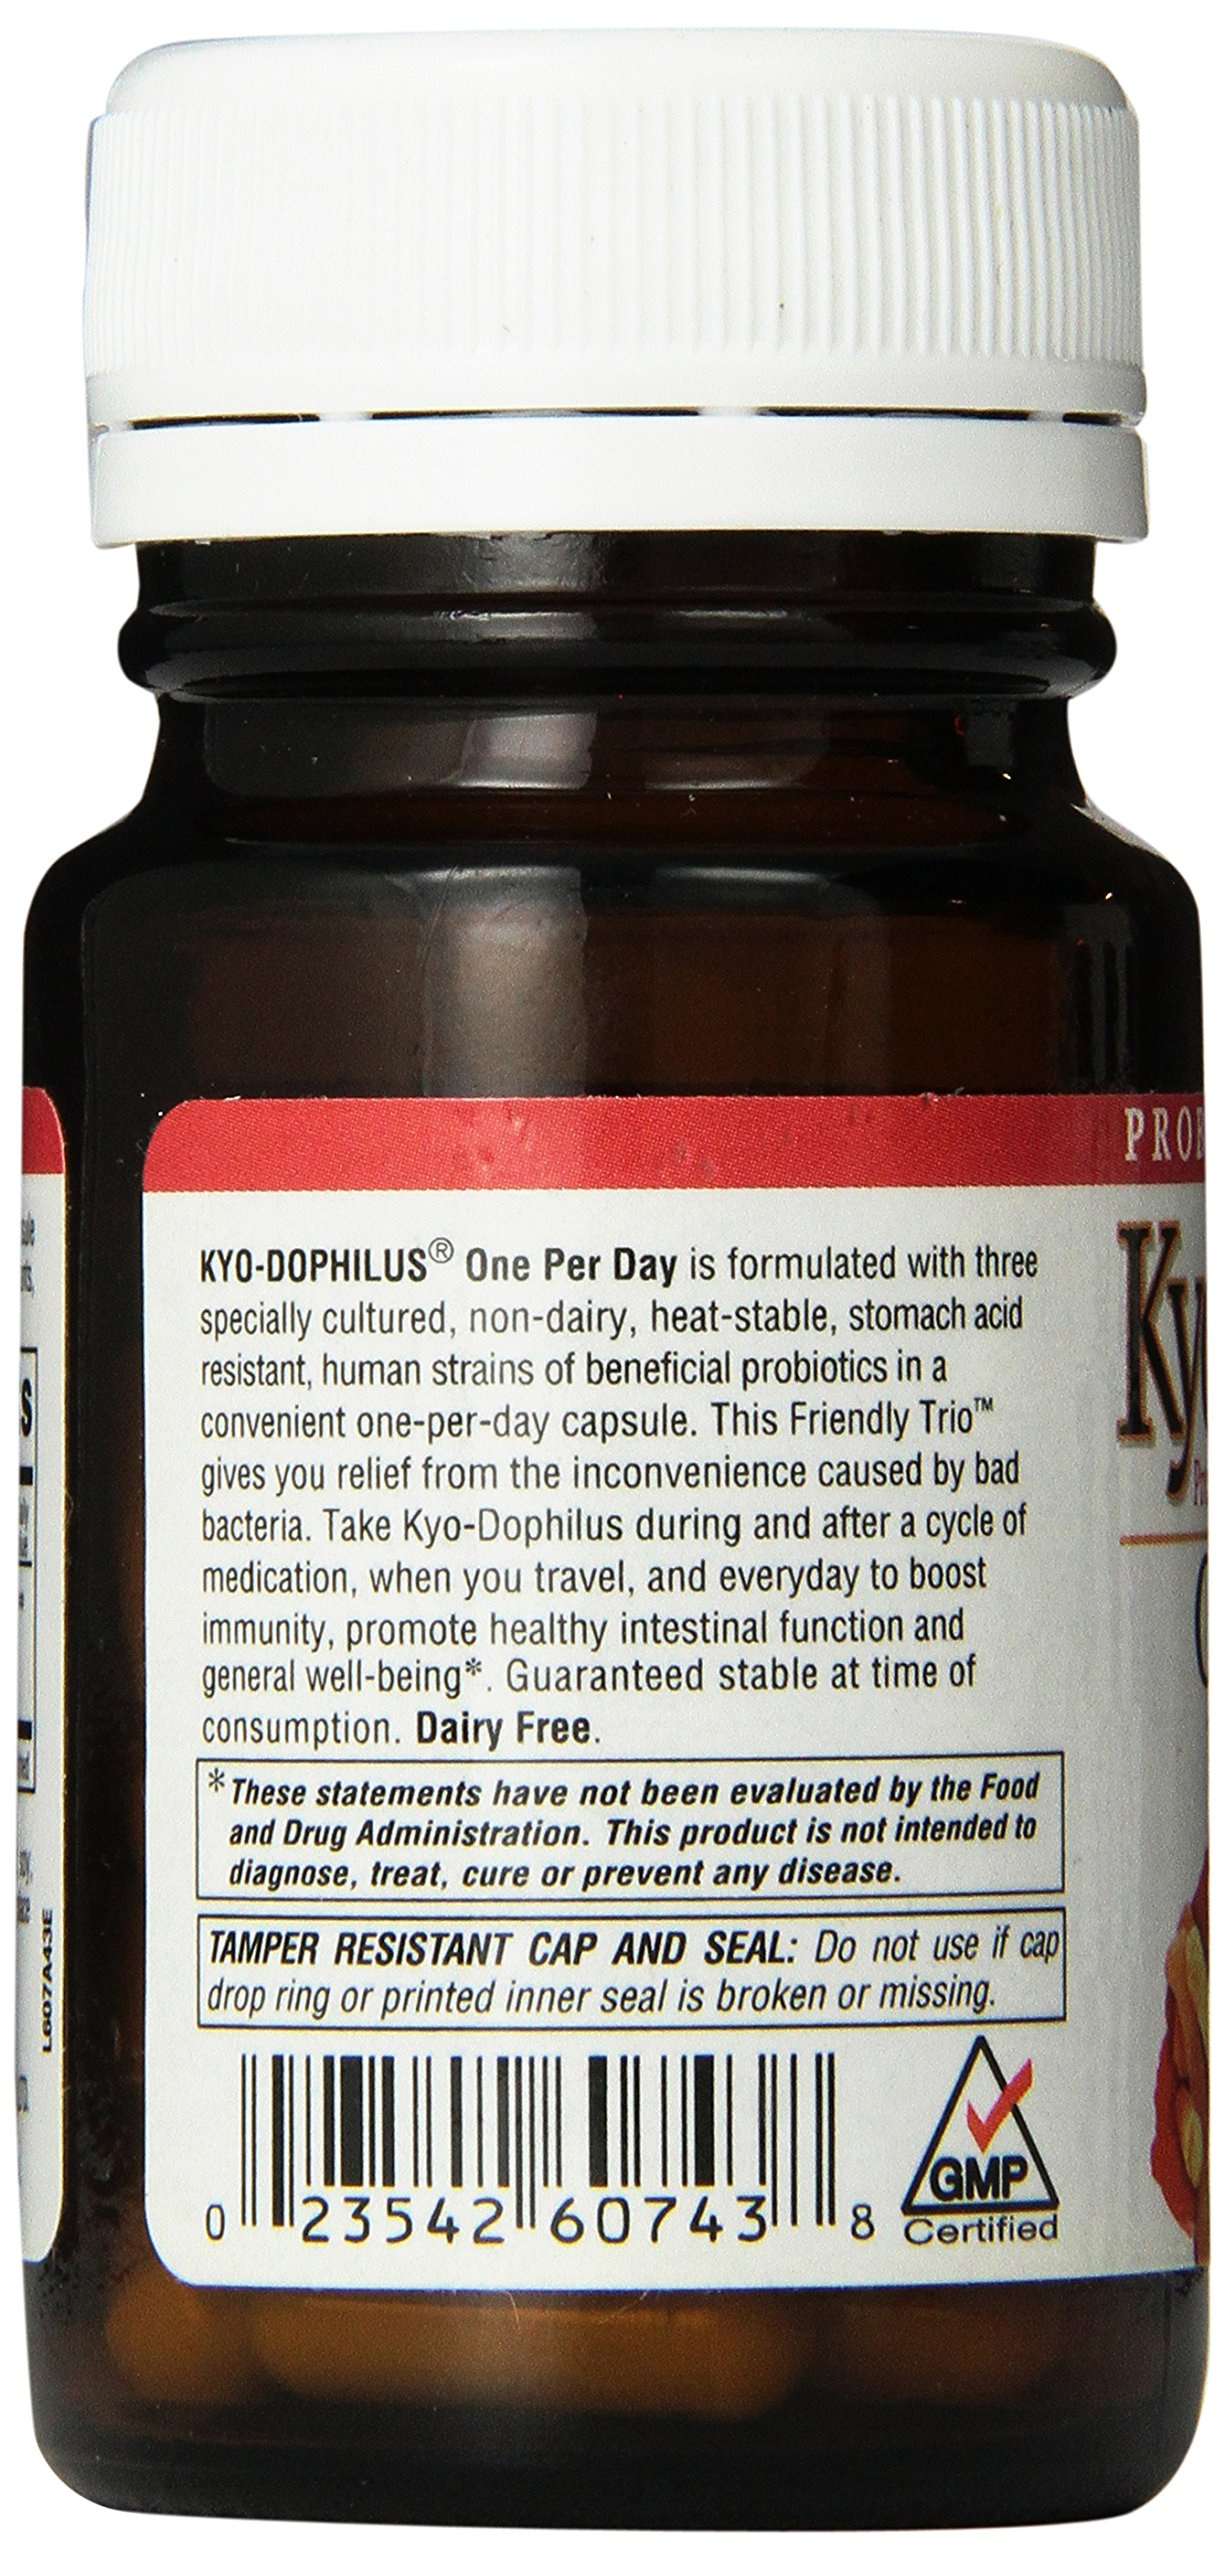 Kyo-Dophilus One Per Day Probiotic Supplement (30 Capsules ...